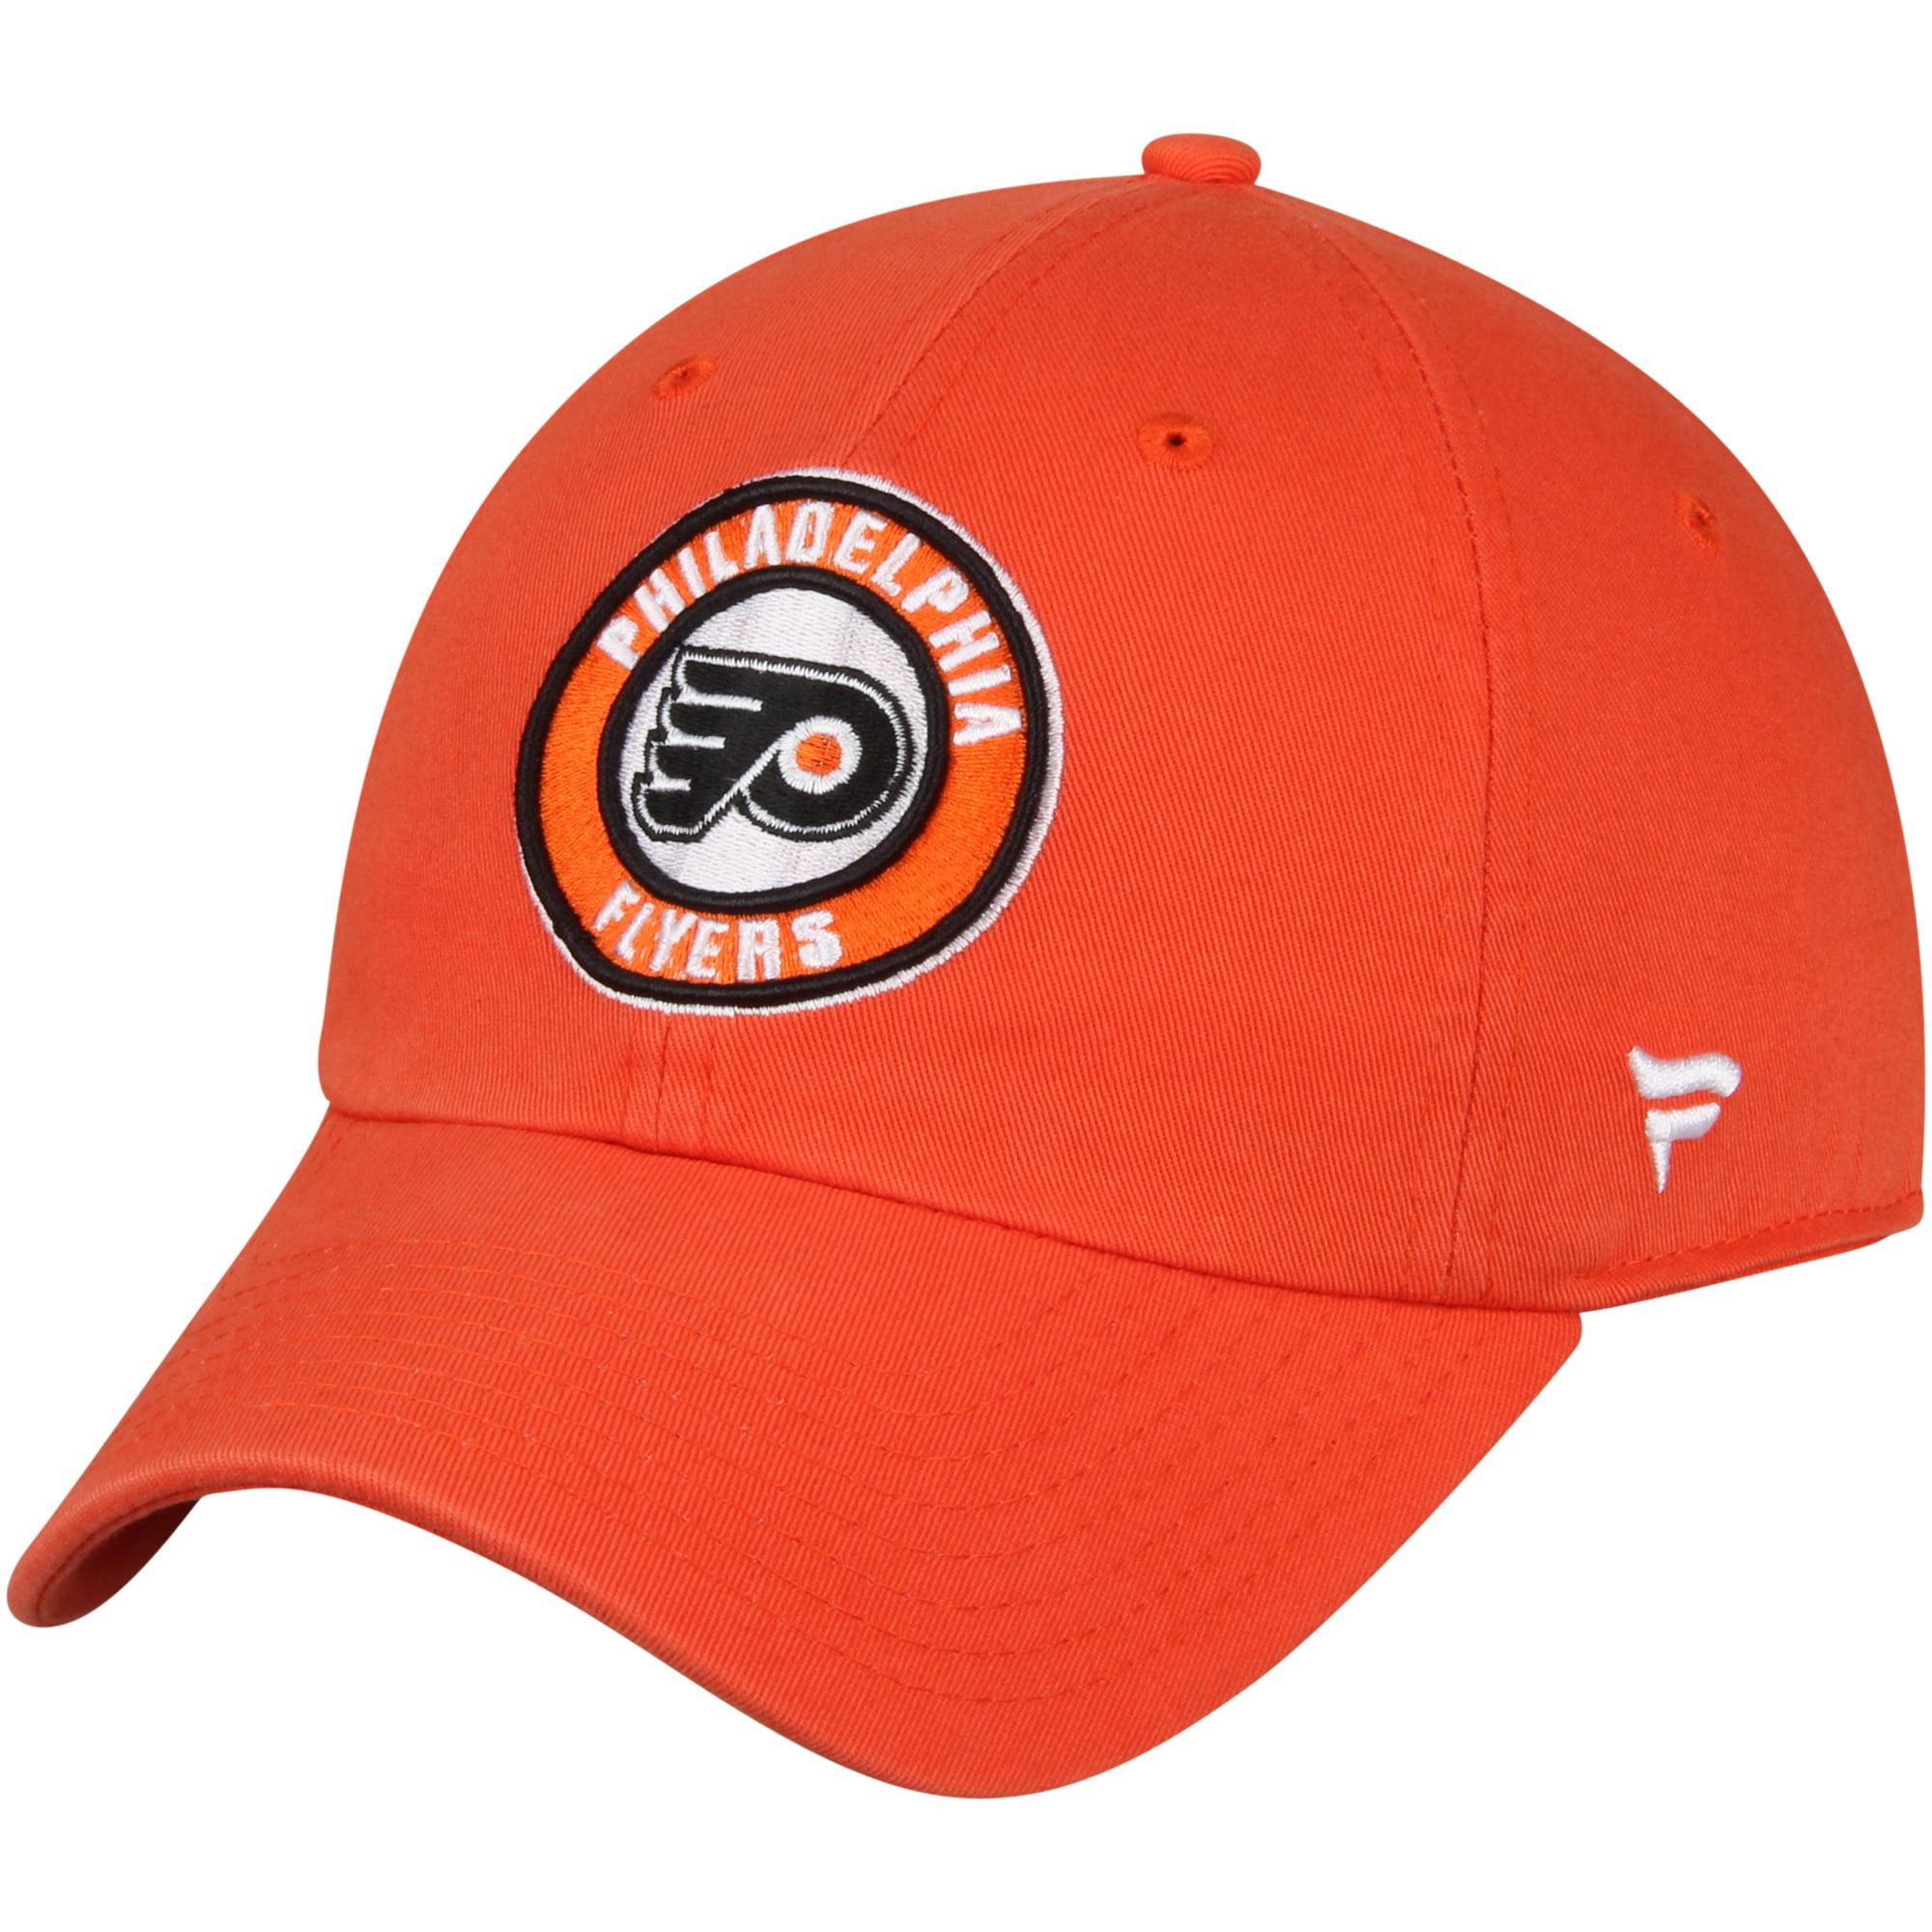 Philadelphia Flyers Fanatics Branded Title Fundamental Adjustable Hat - Orange - OSFA